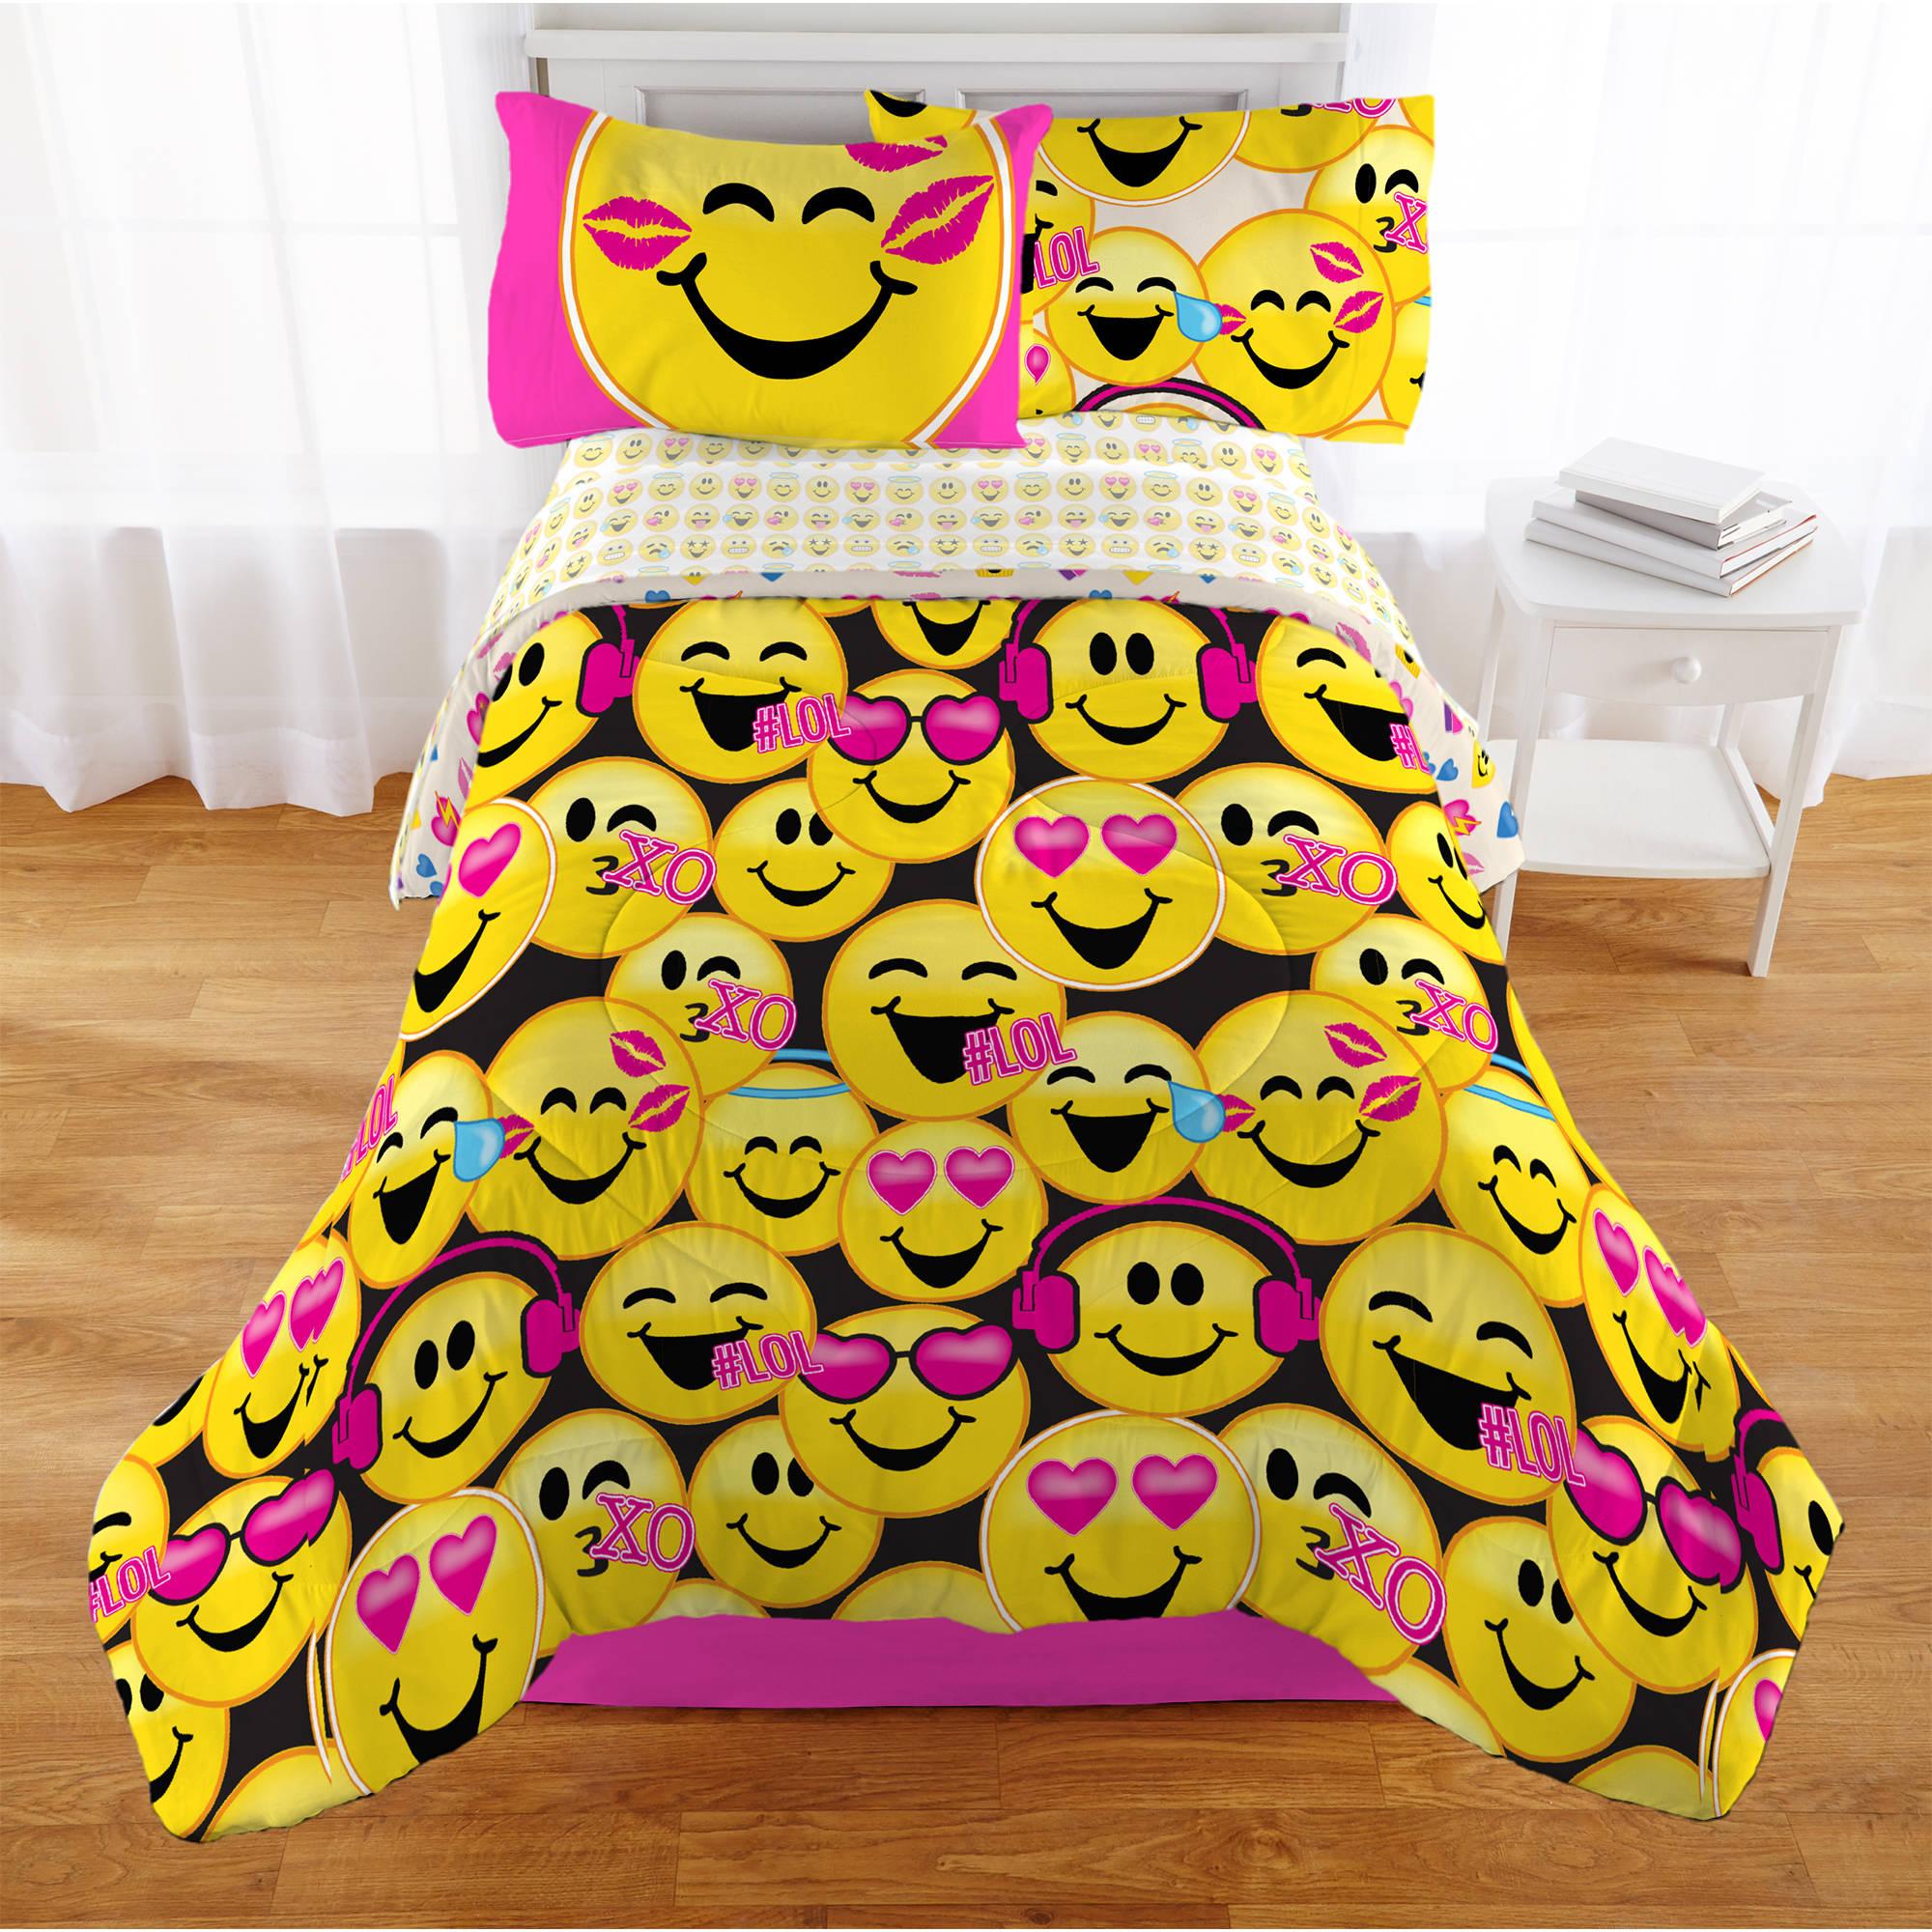 Emoji Nation 'Happy Happy' Twin Bedding Bed in a Bag